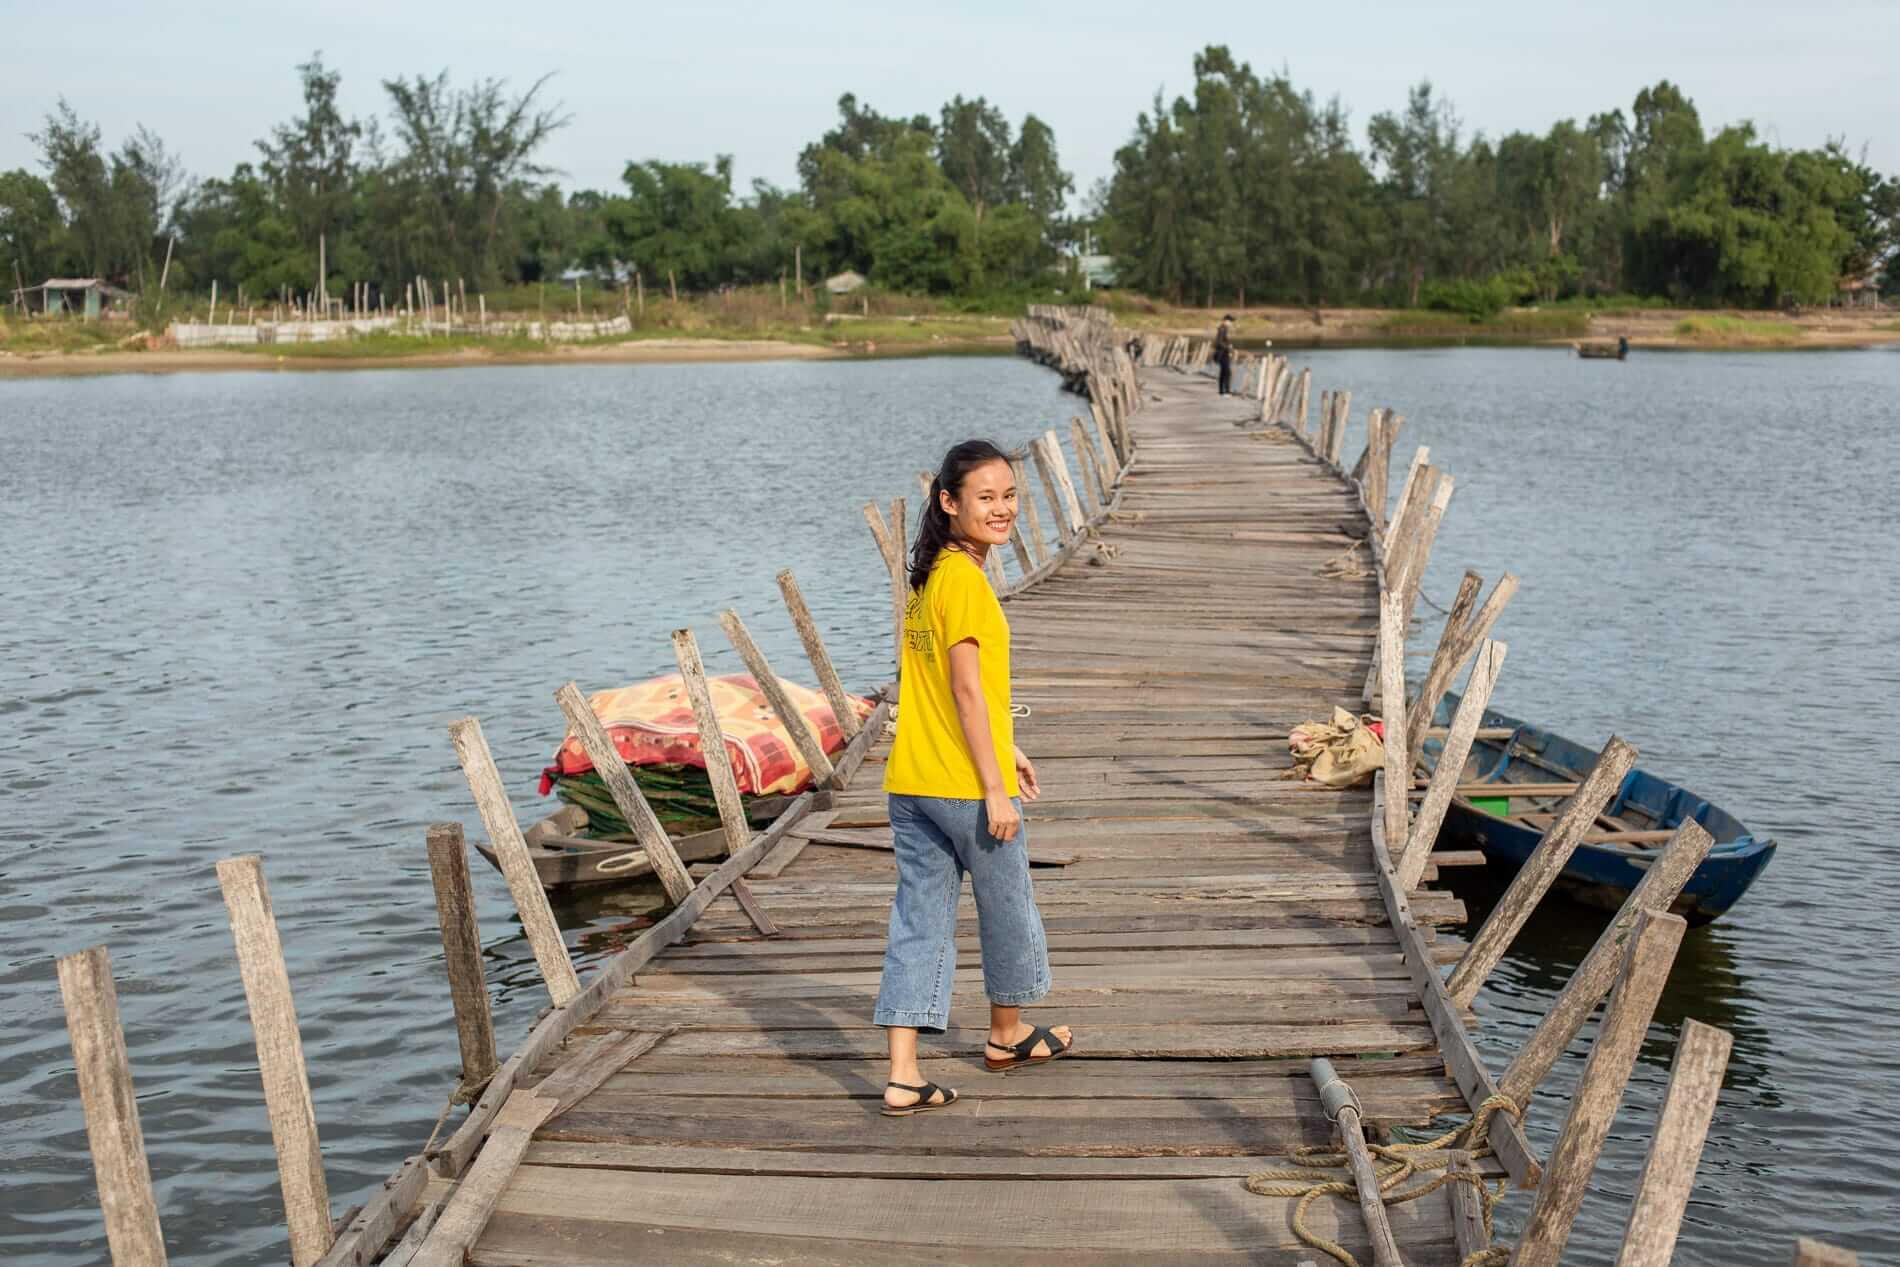 Tram knows Duy Vinh Island